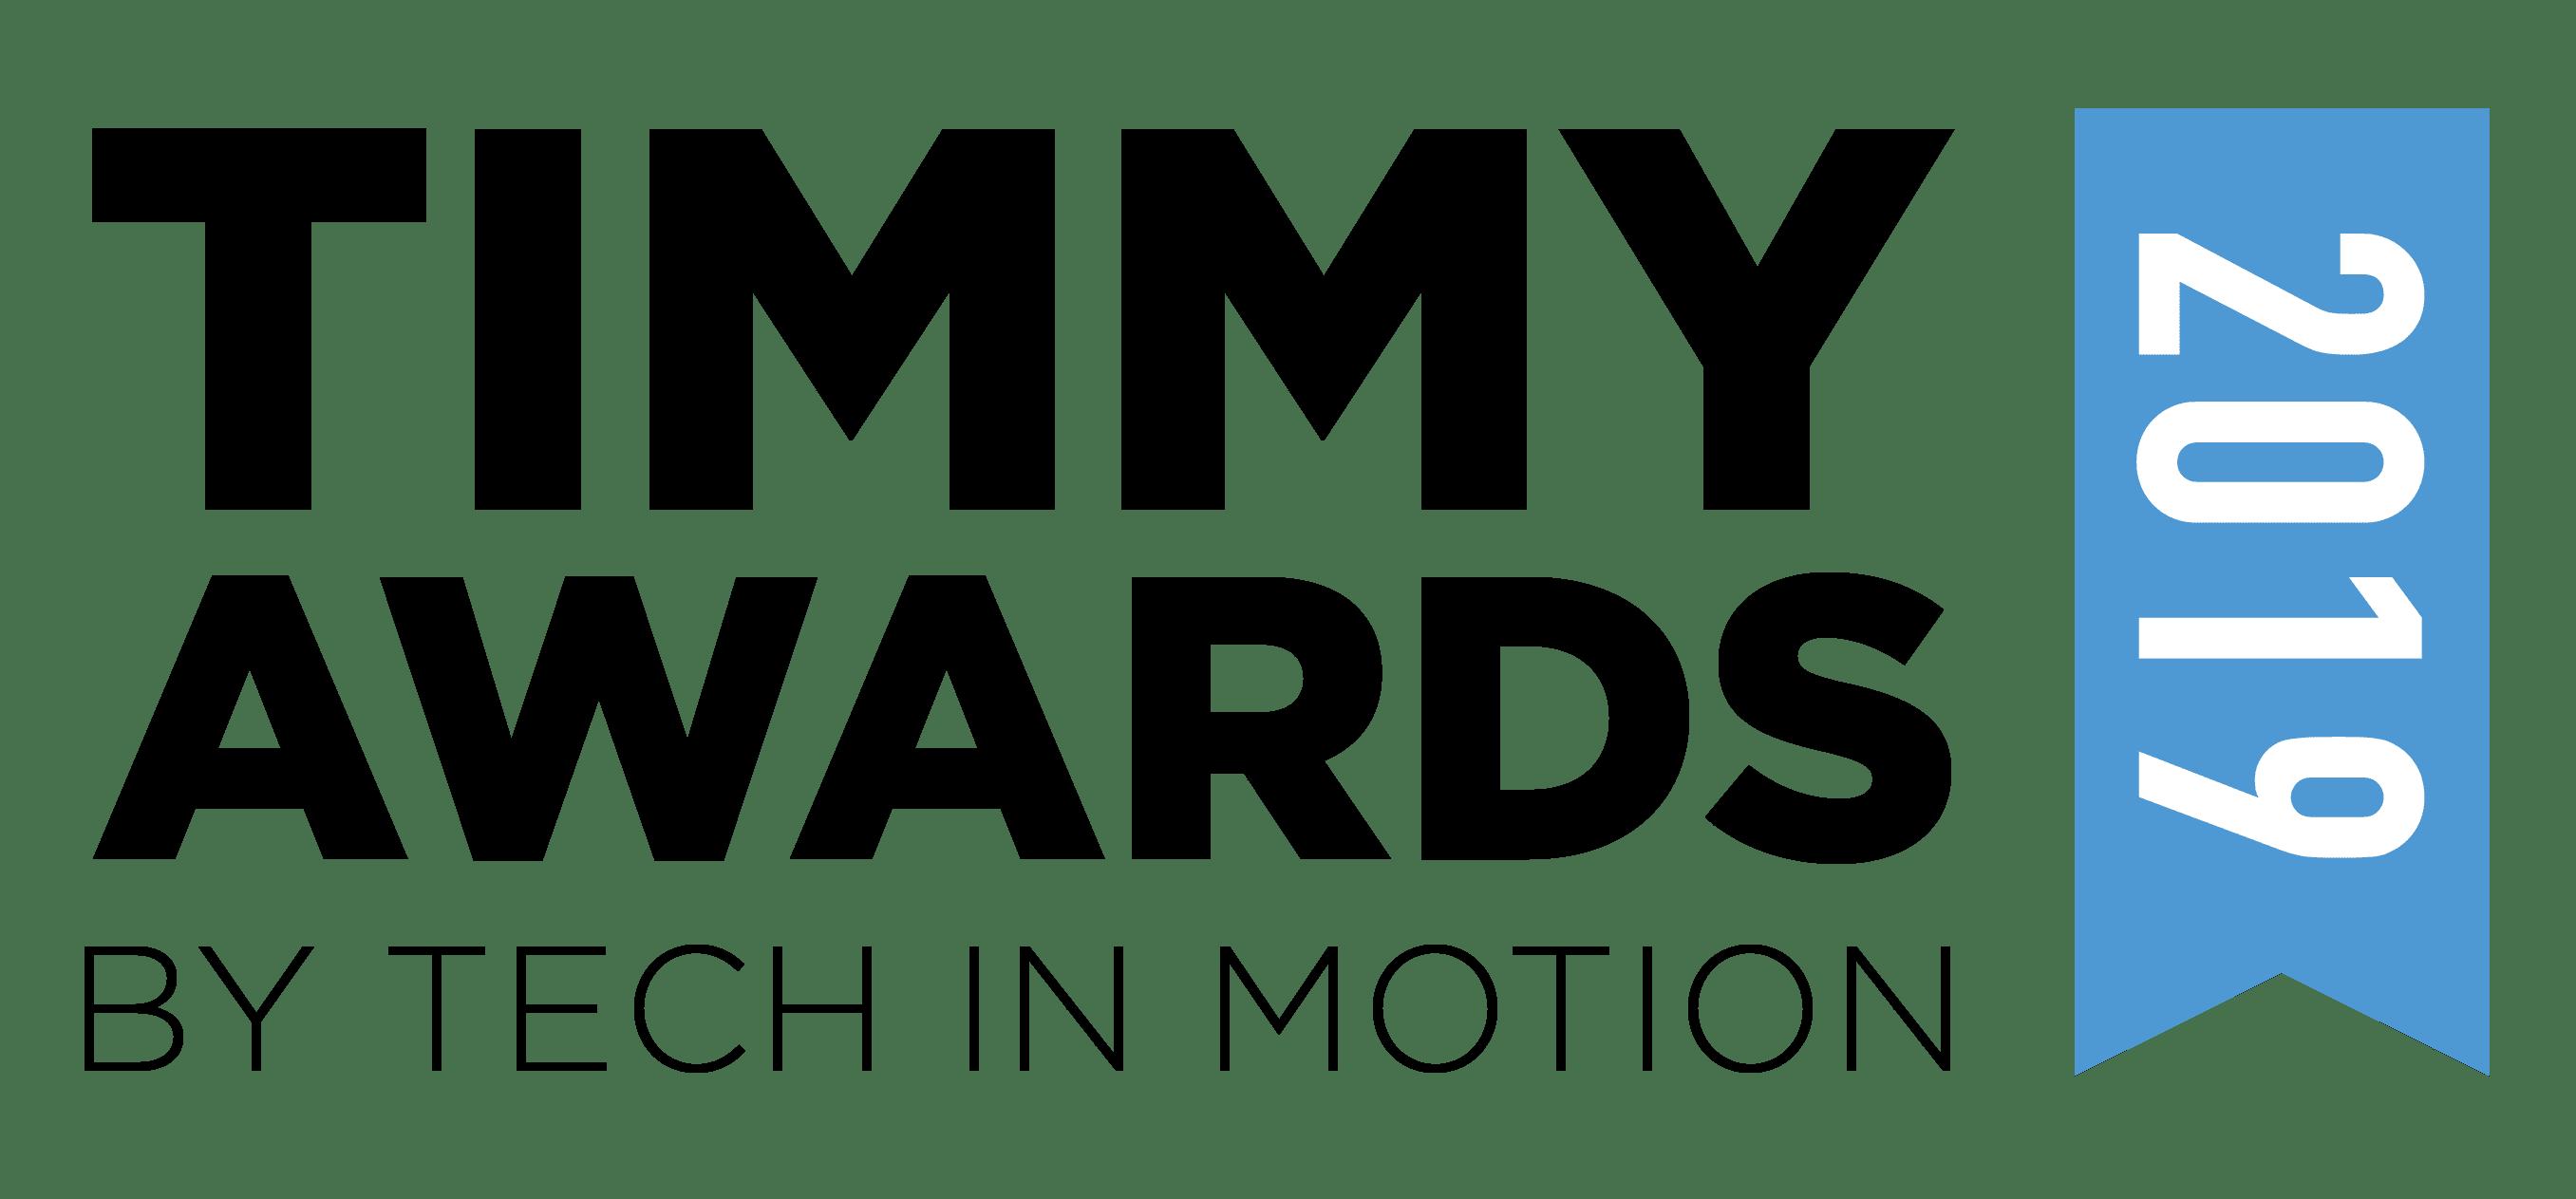 Fuel Cycle Blog: Timmy Awards Logo 2019